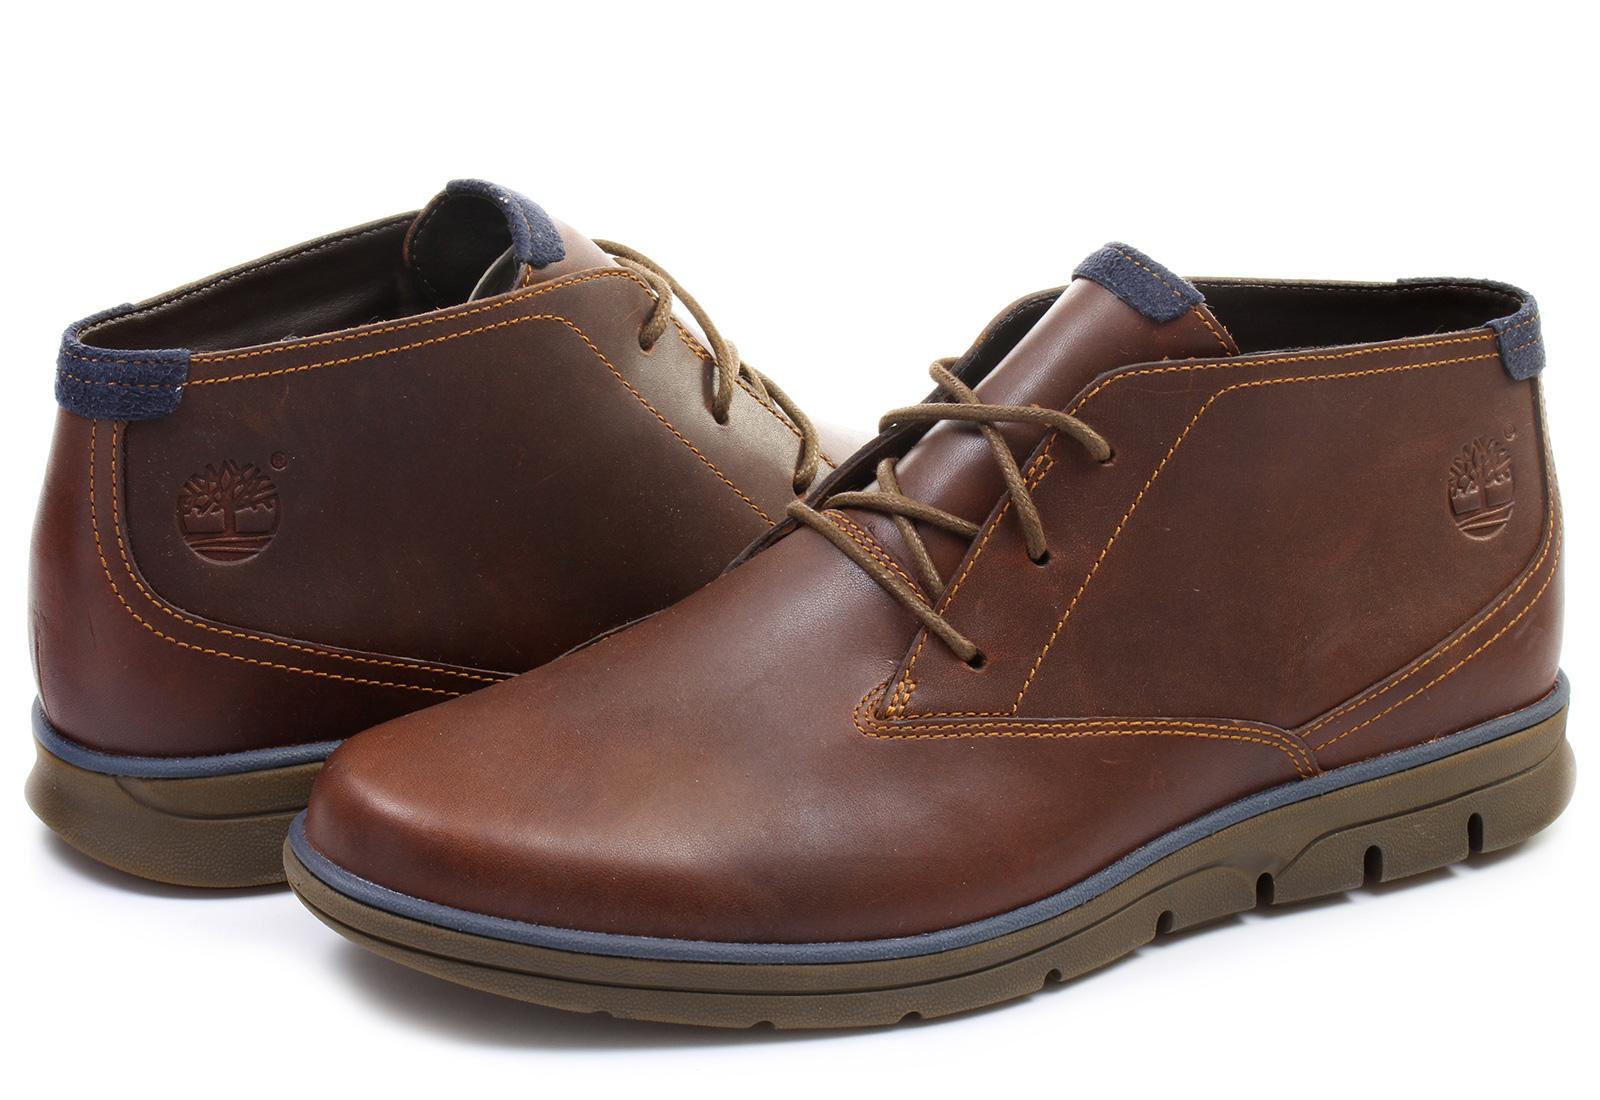 Timberland Shoes Bradstreet Chukka